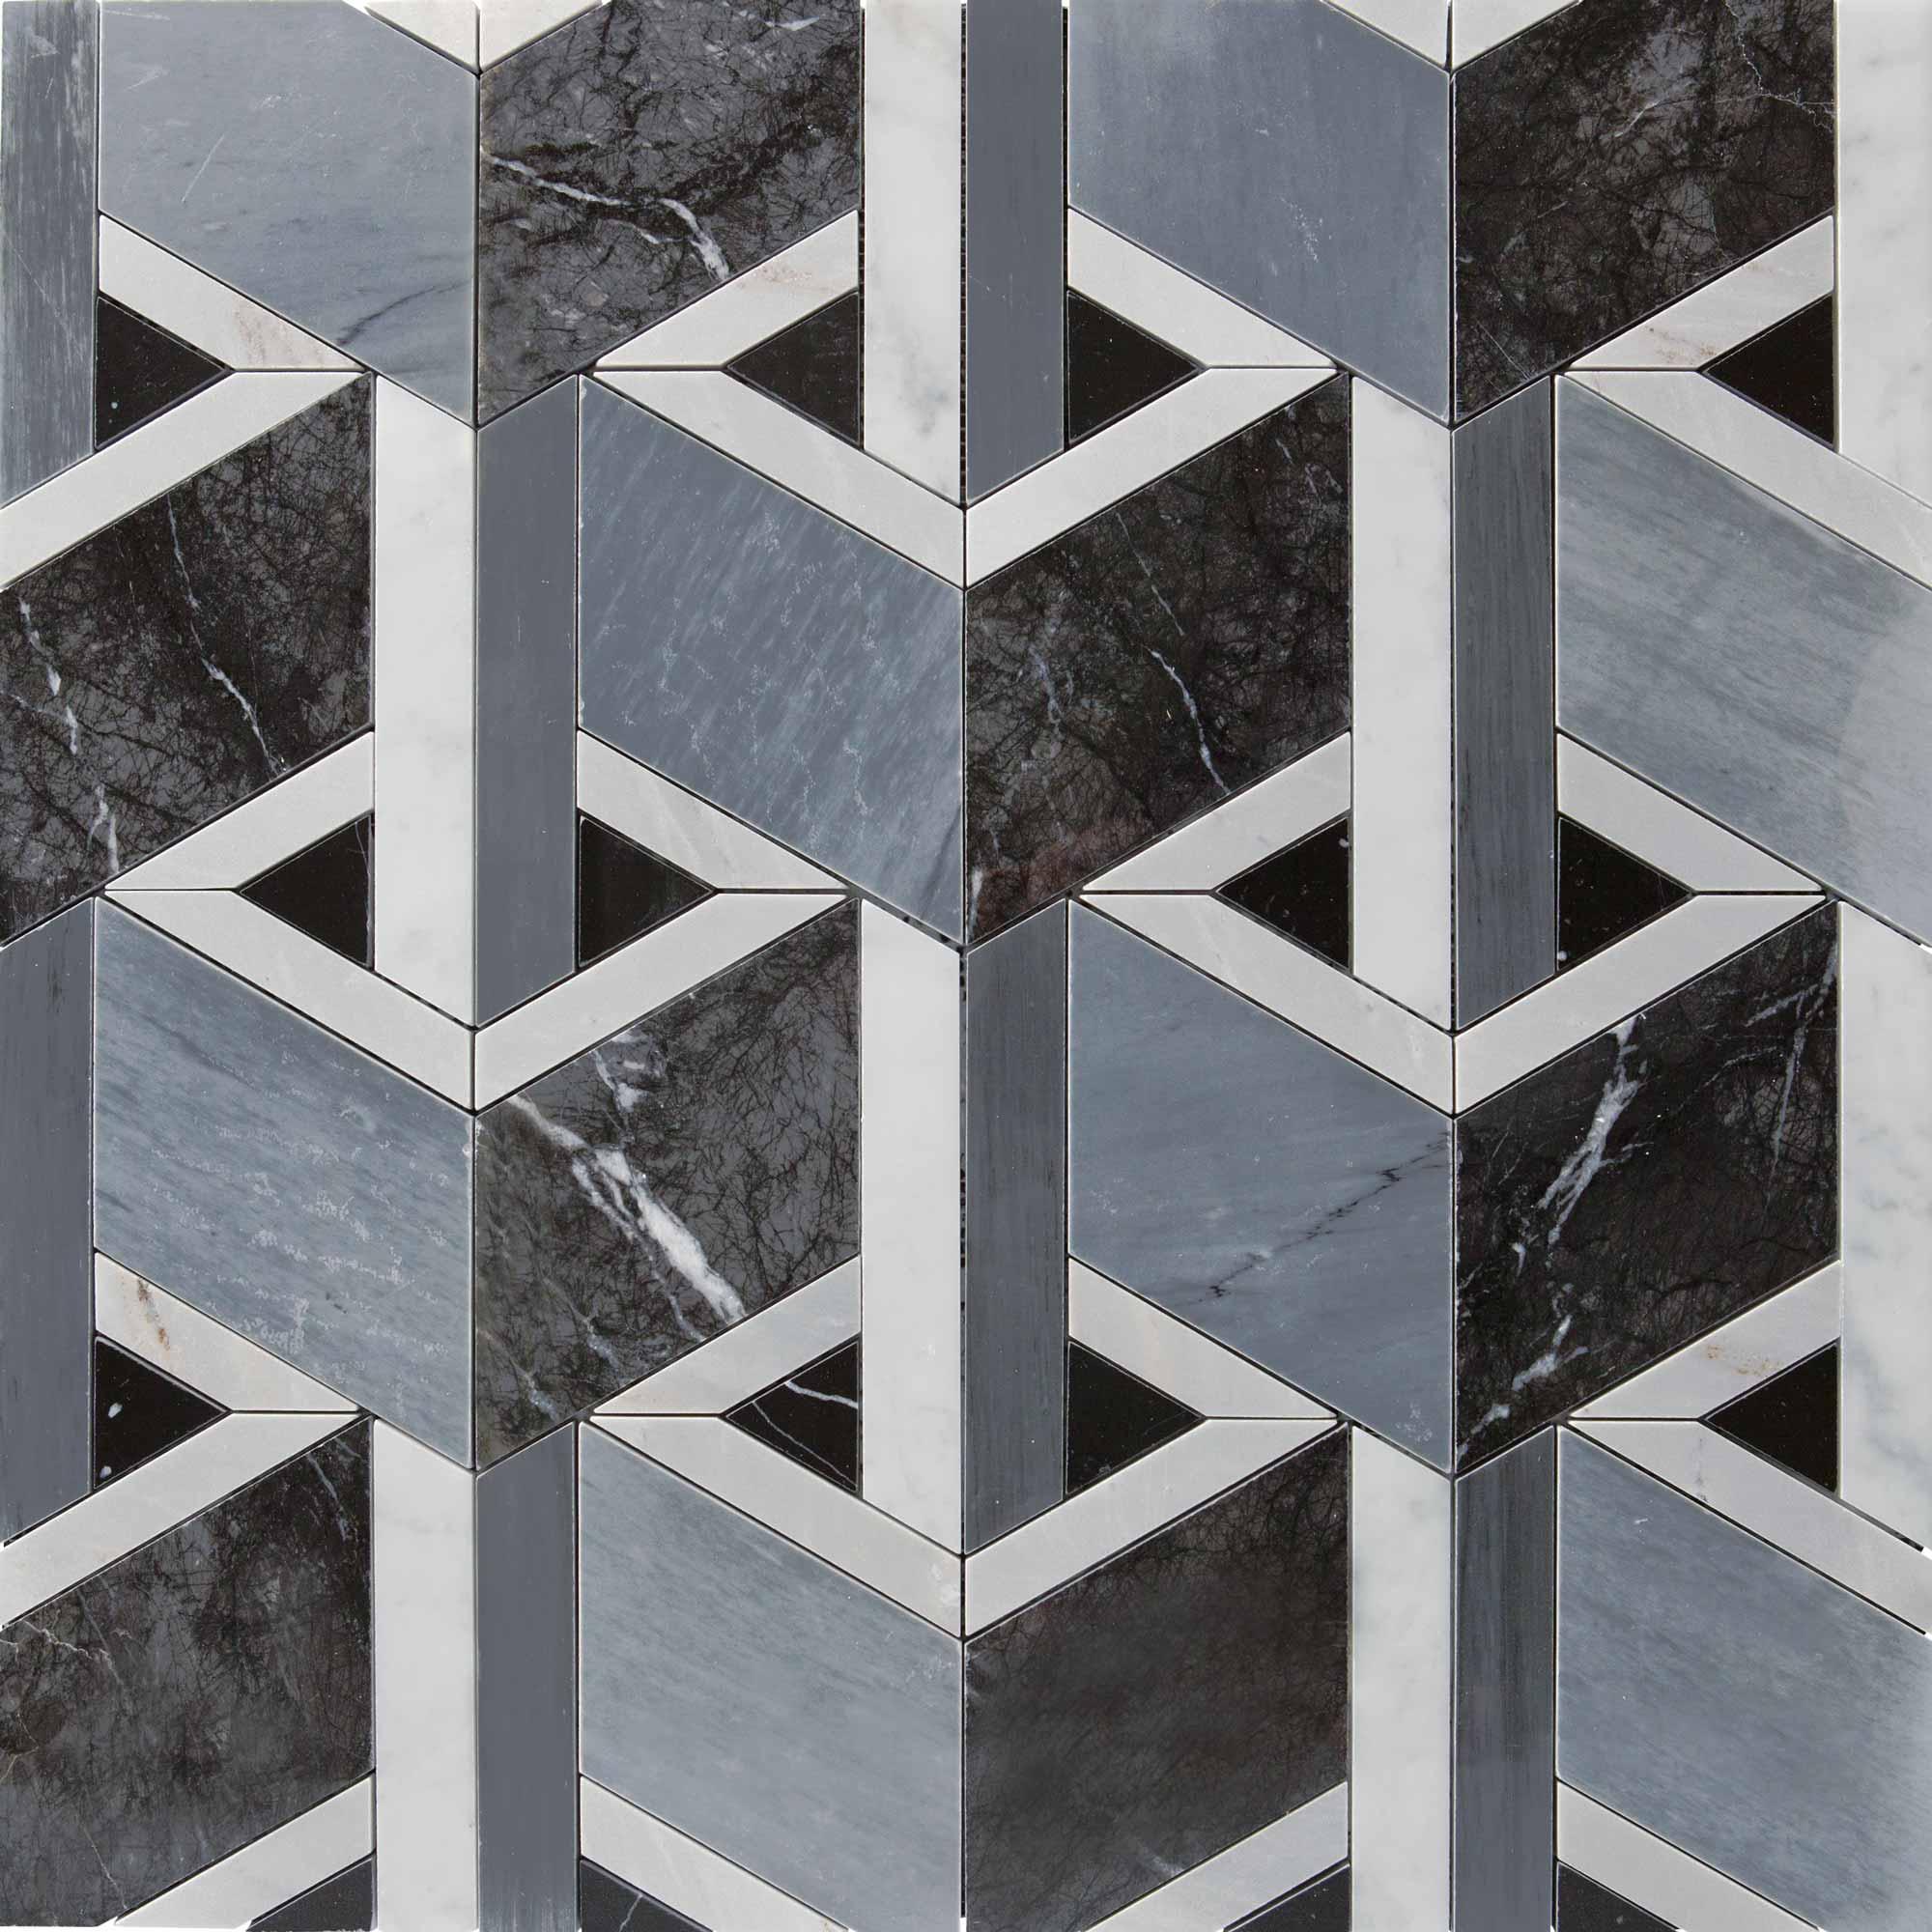 Lithos Mosaico Italia Cube 300 x 360x360 mod